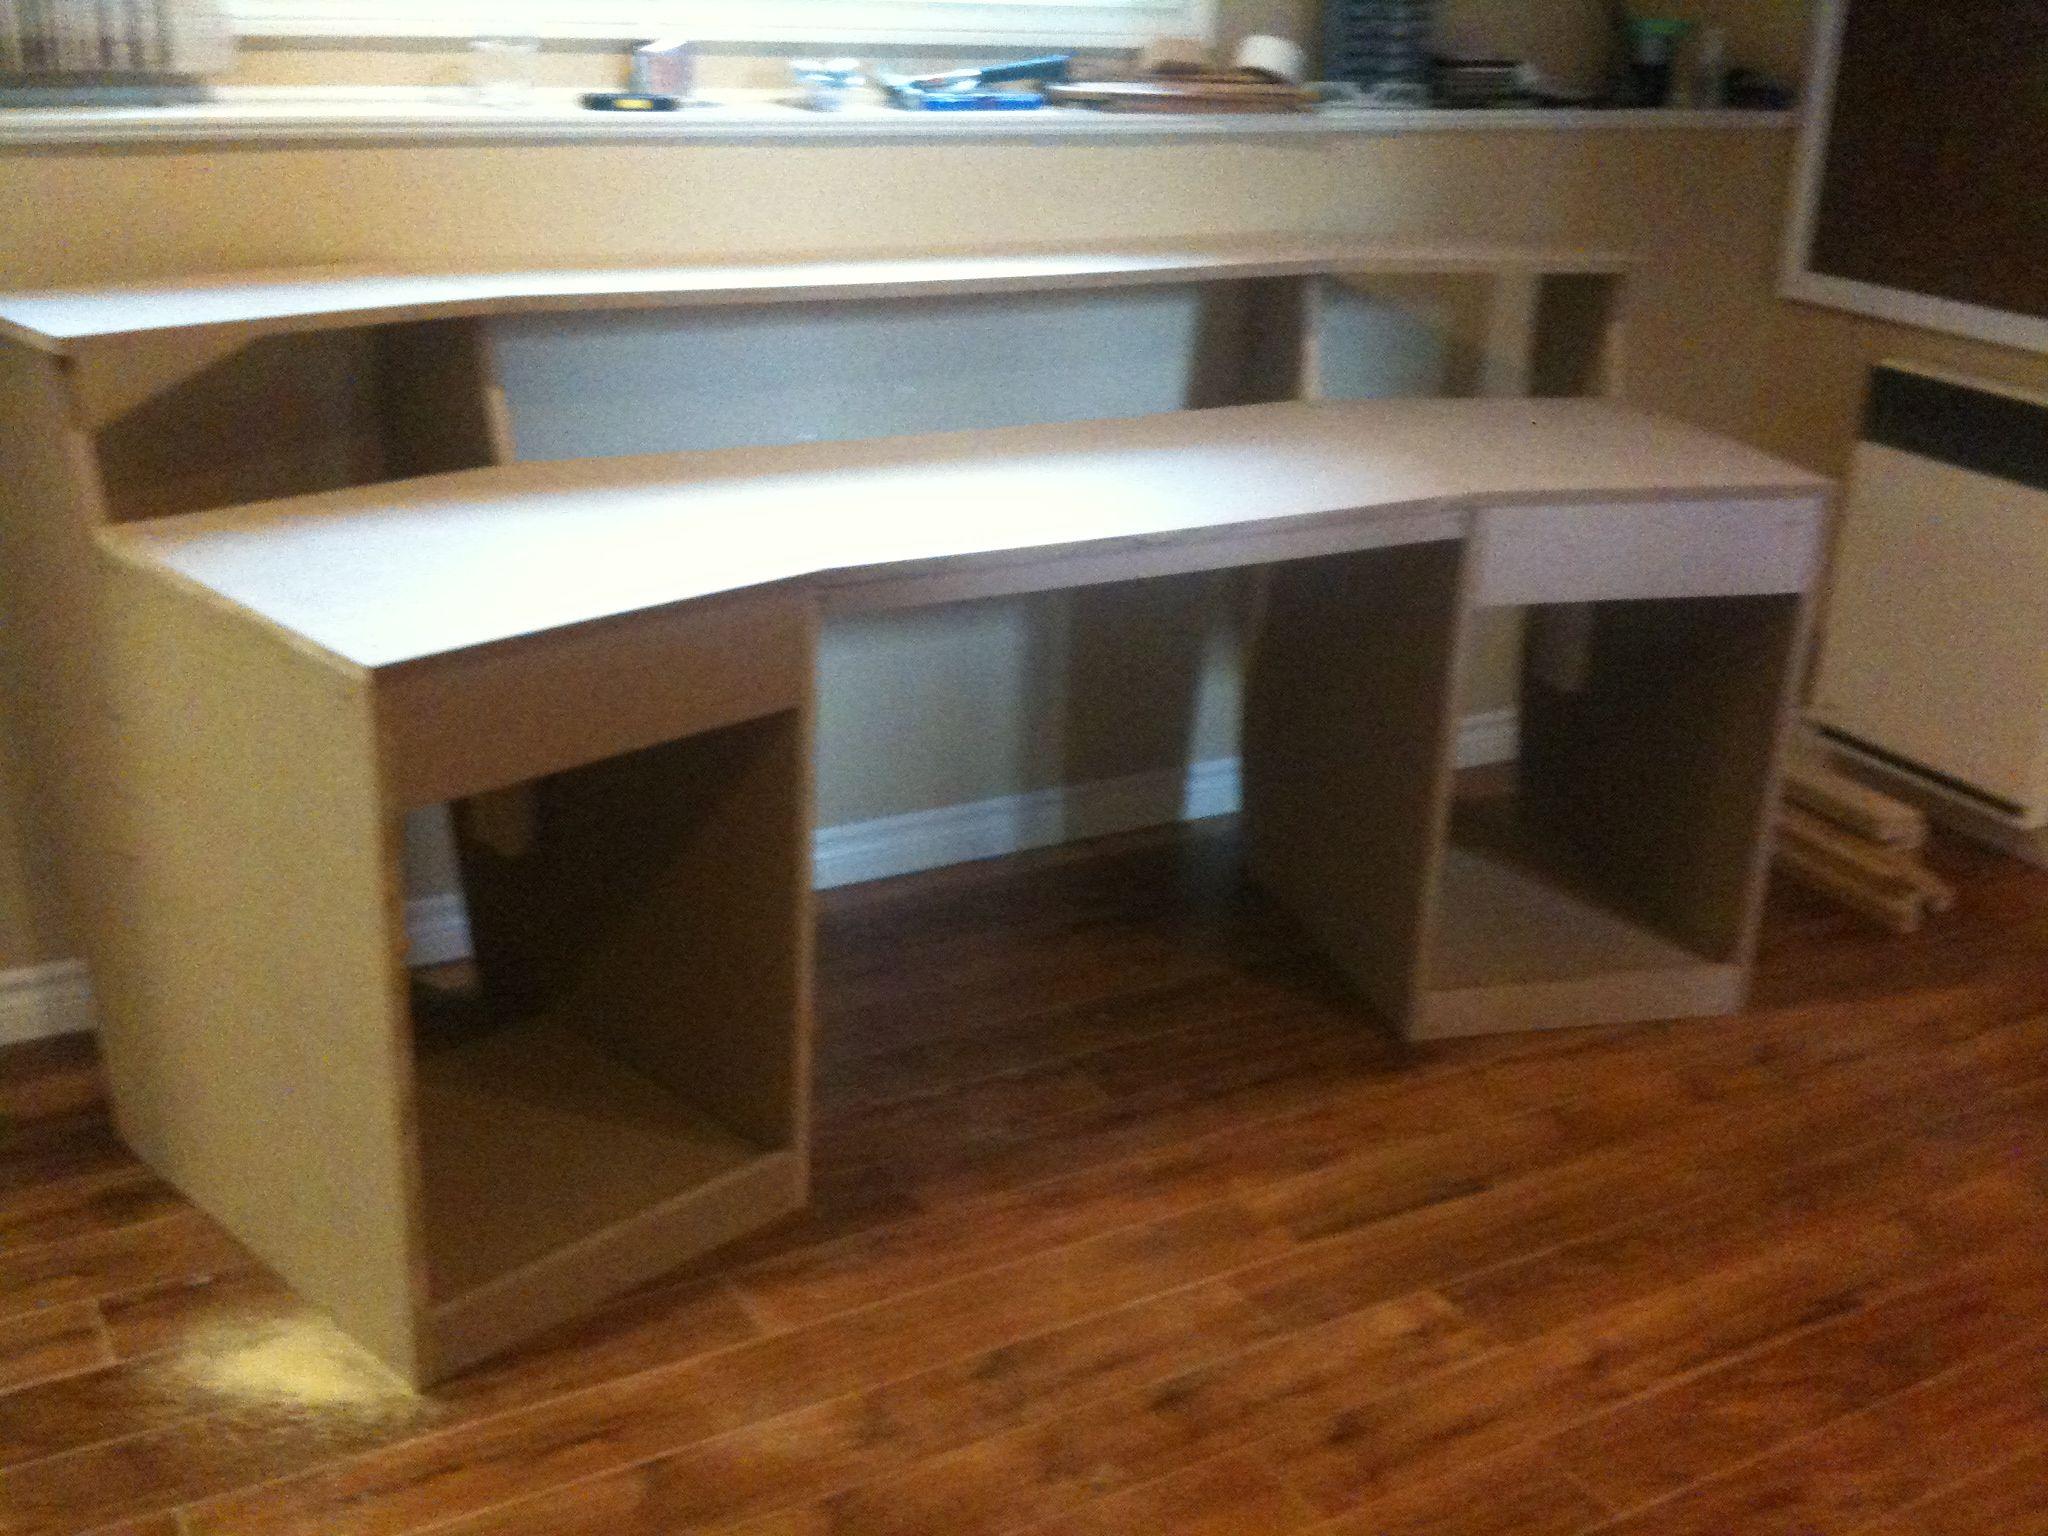 How To Build Studio Desk Plans Pdf Woodworking Plans Studio Desk Plans I Too I Just Learned How To Use Is Http Kkeeyy A Home Studio Desk Desk Plans Studio Desk